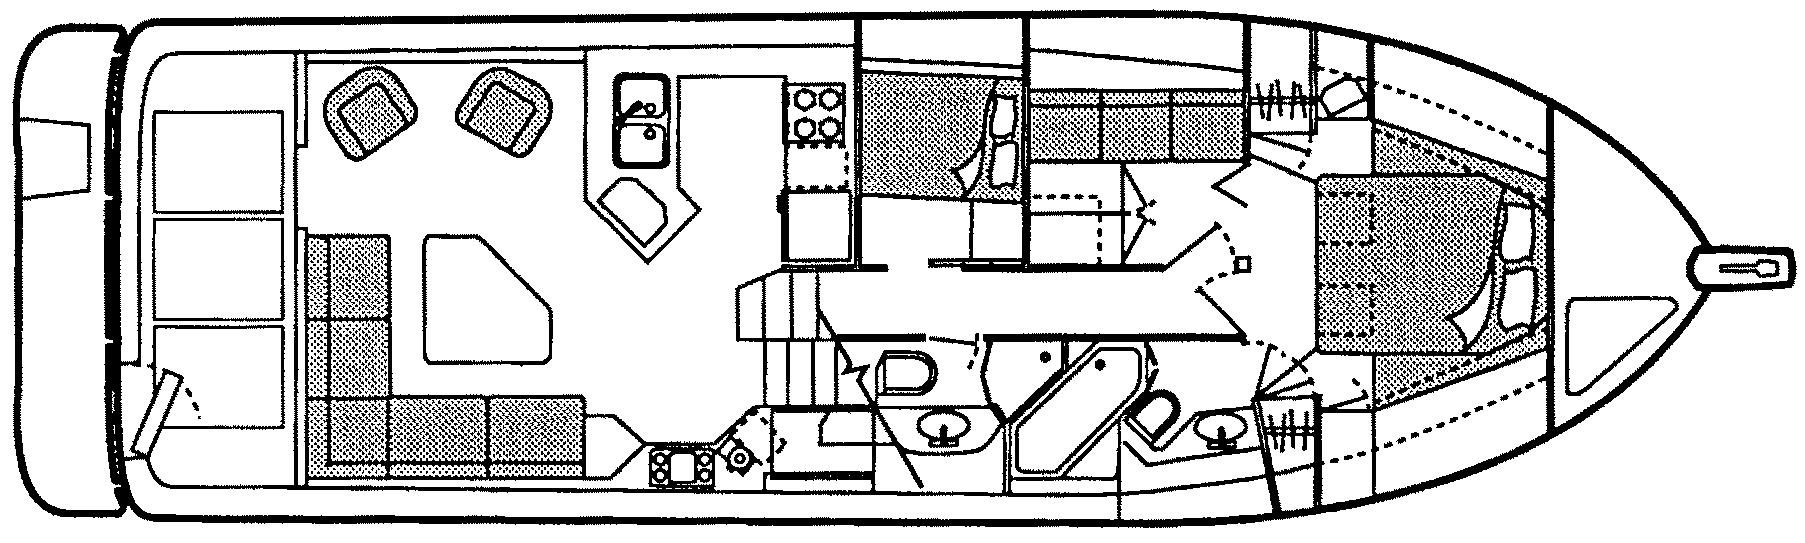 4788 Pilothouse Floor Plan 1